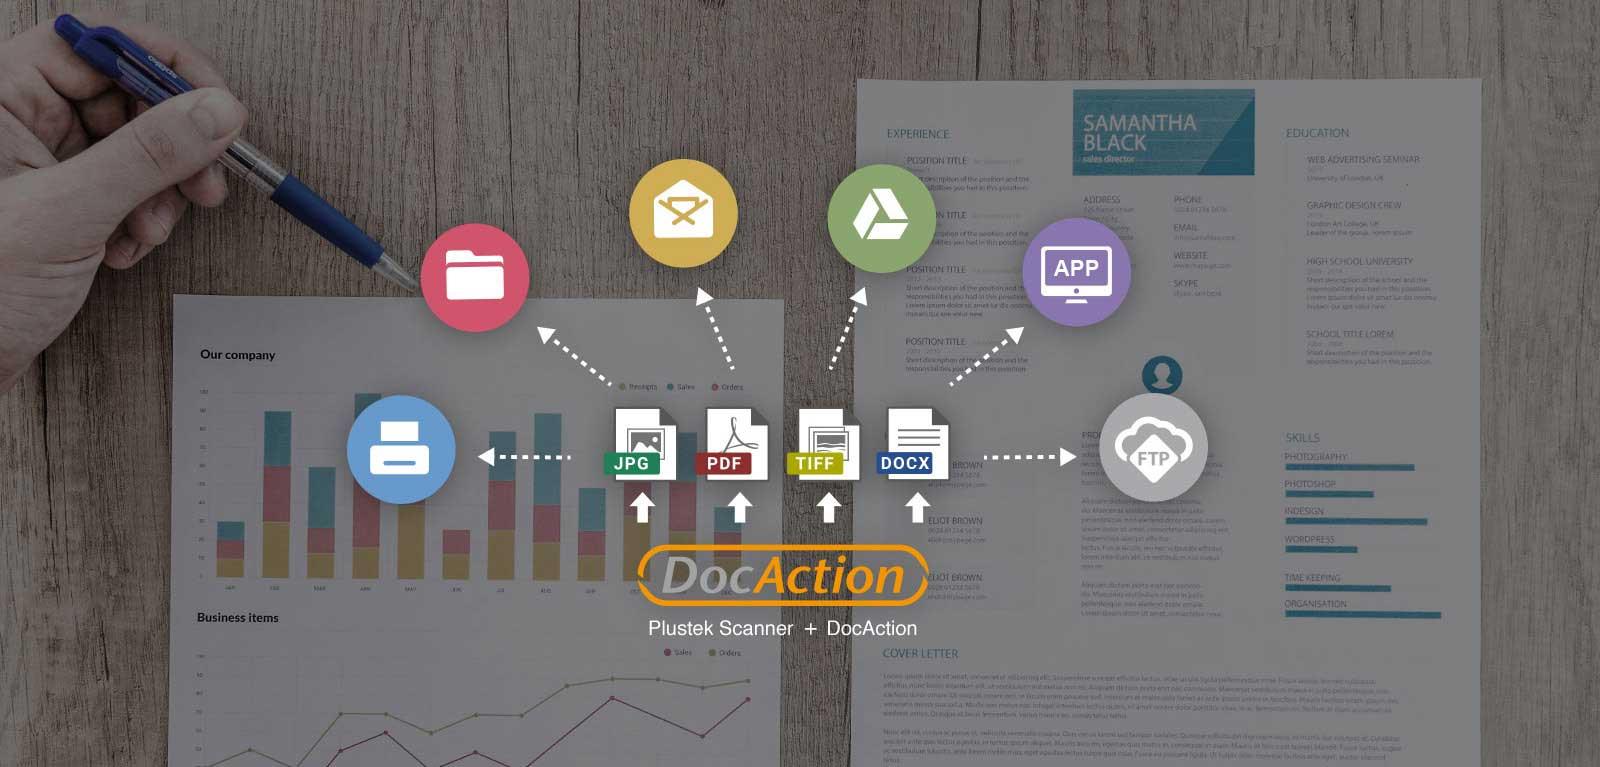 Drucker,Ordner,E-Mail,Cloud Daten ,Anwendung,FTP,JPG-Format,PDF ,TIFF,Word DOCX